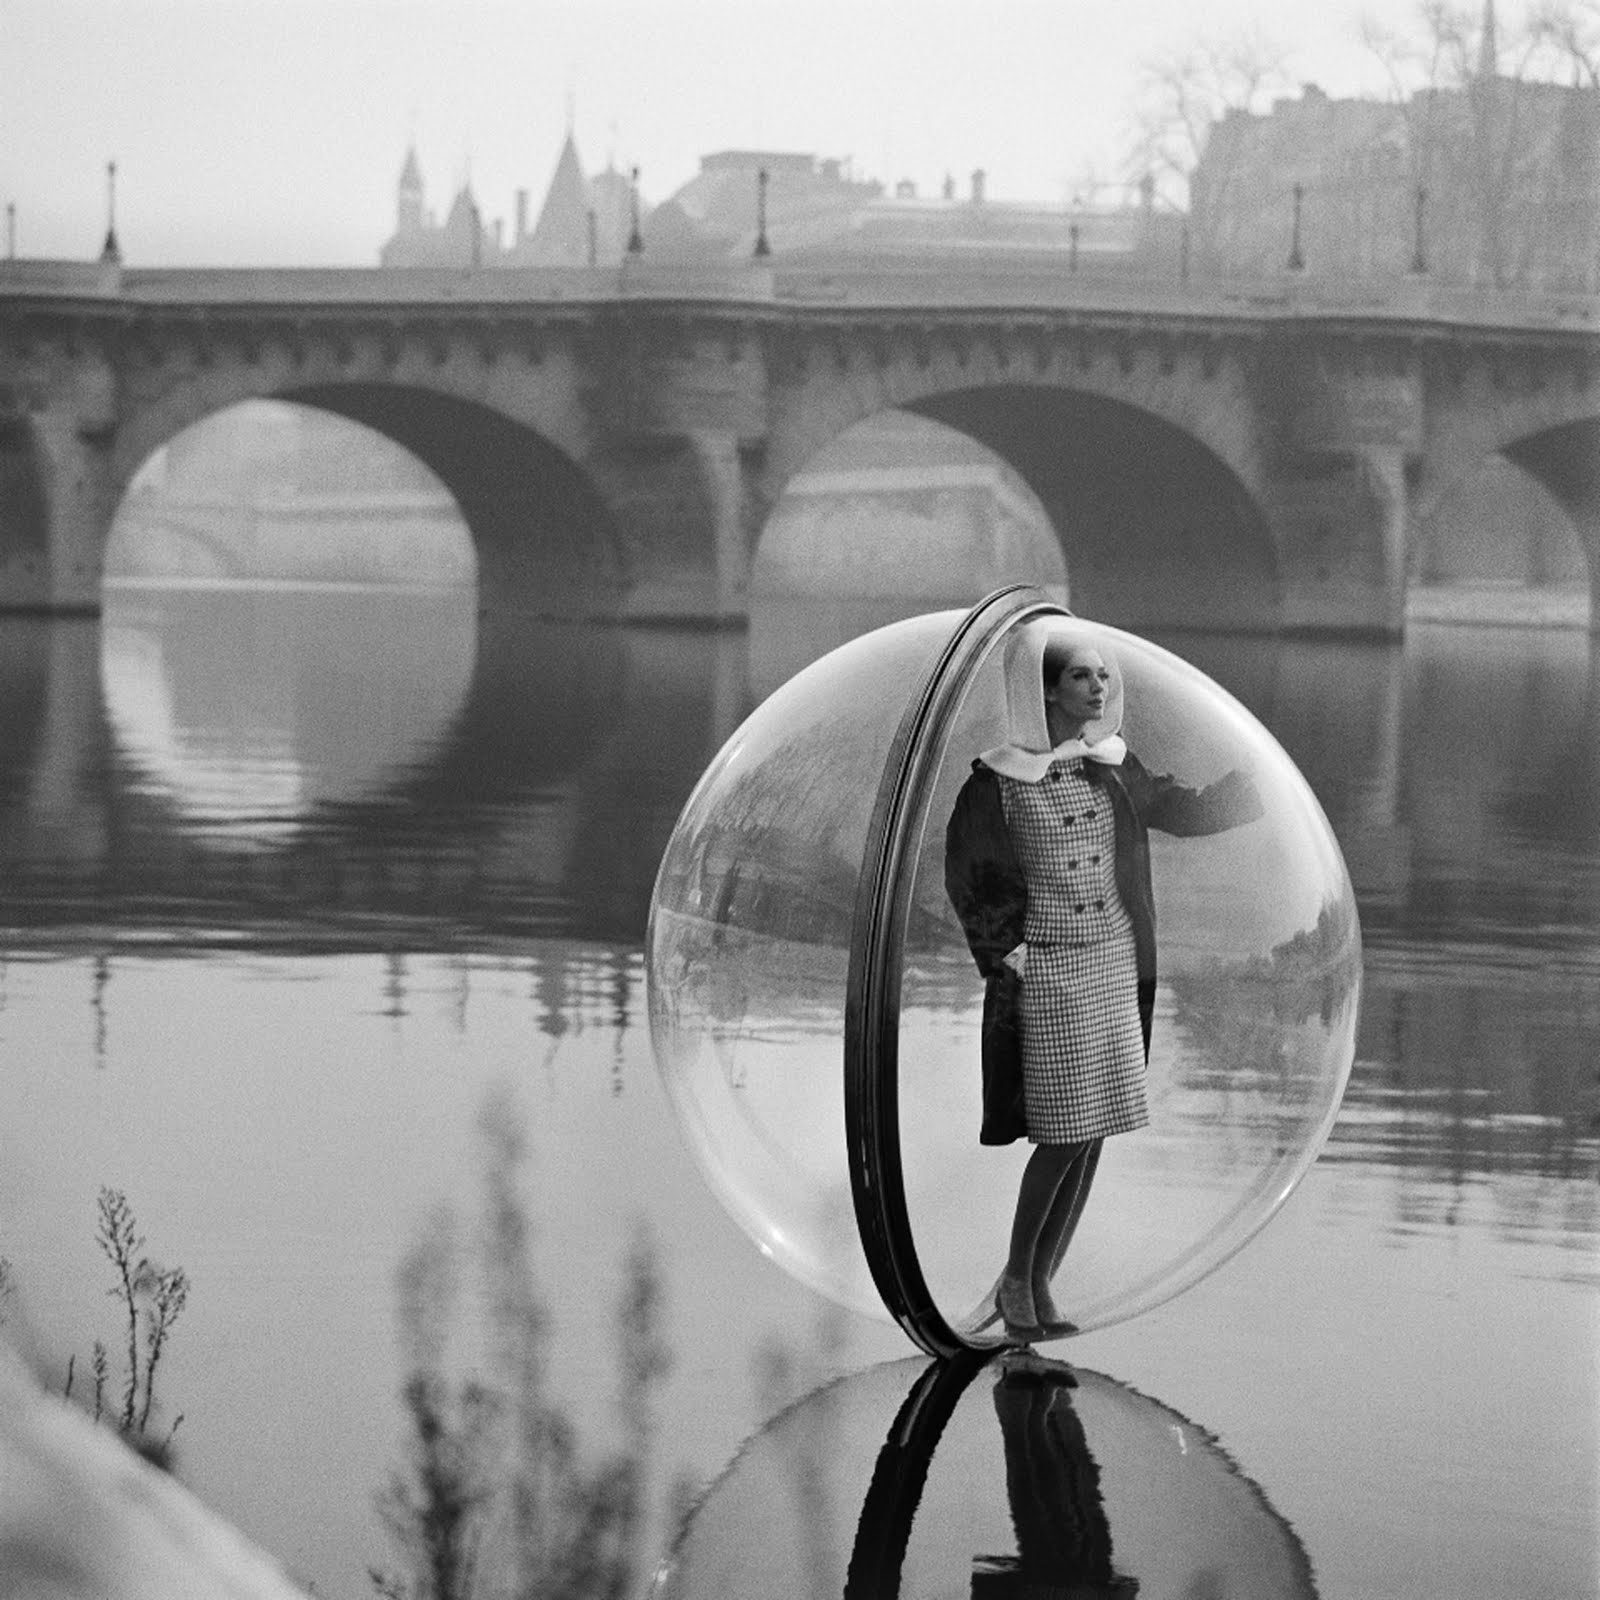 SOKOLSKY-Bubble_seine.jpg